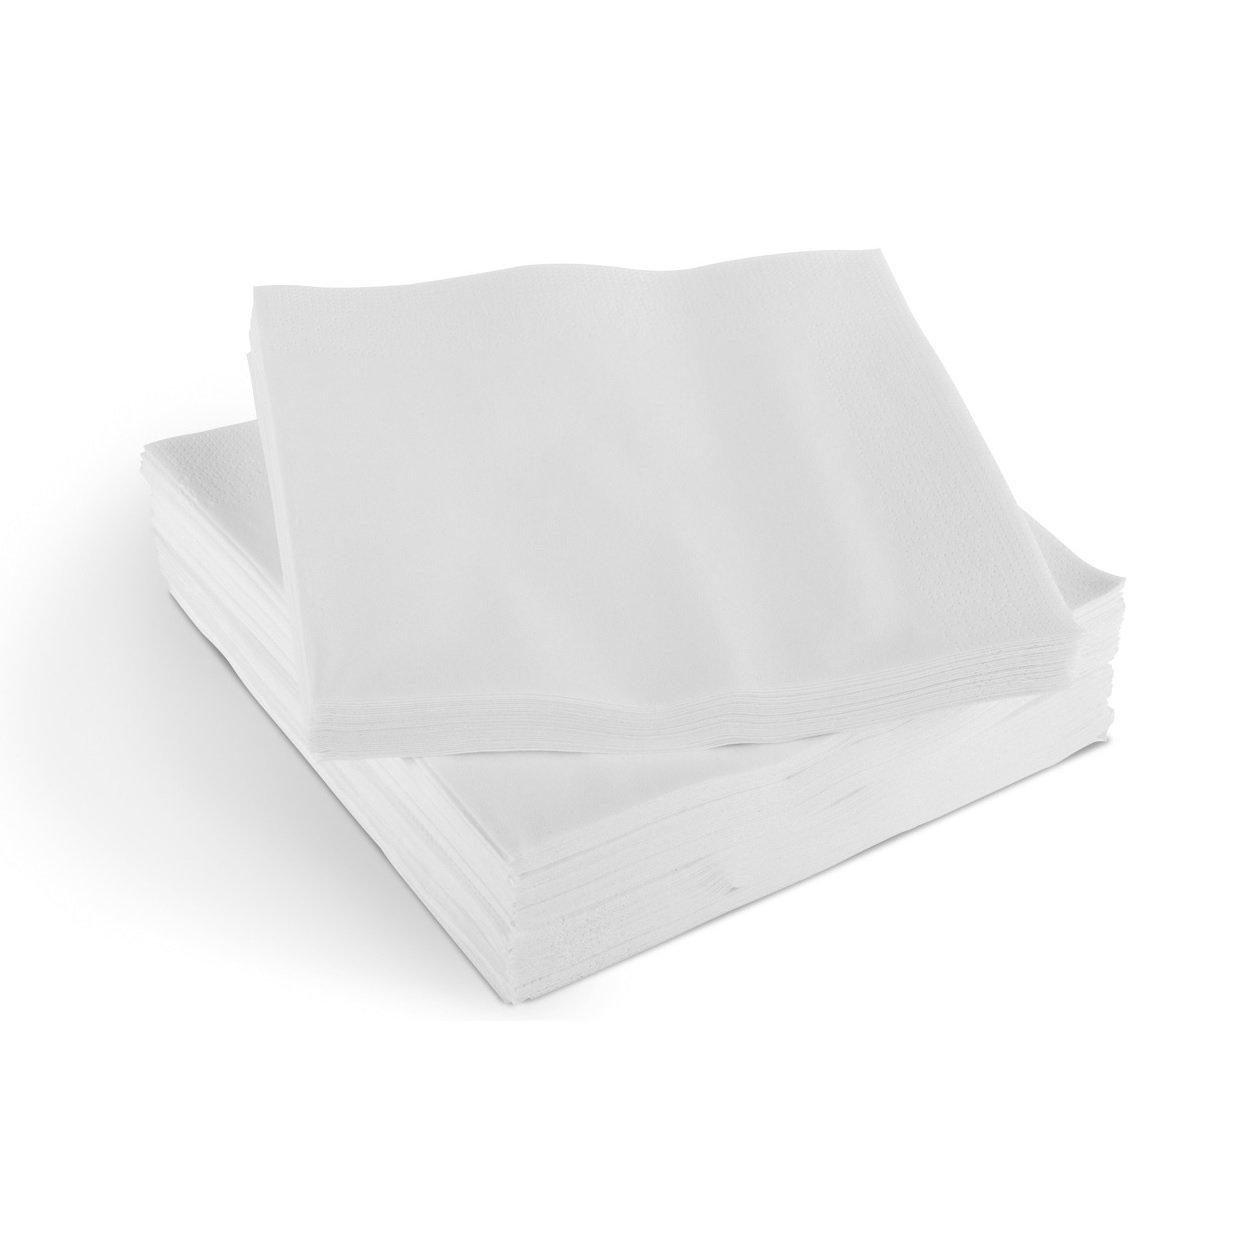 SafePro BNAP, 9''x9'' 1-Ply Beverage Cocktail Paper Napkins, White Disposable Tabletop Napkins, 4000-Piece Case